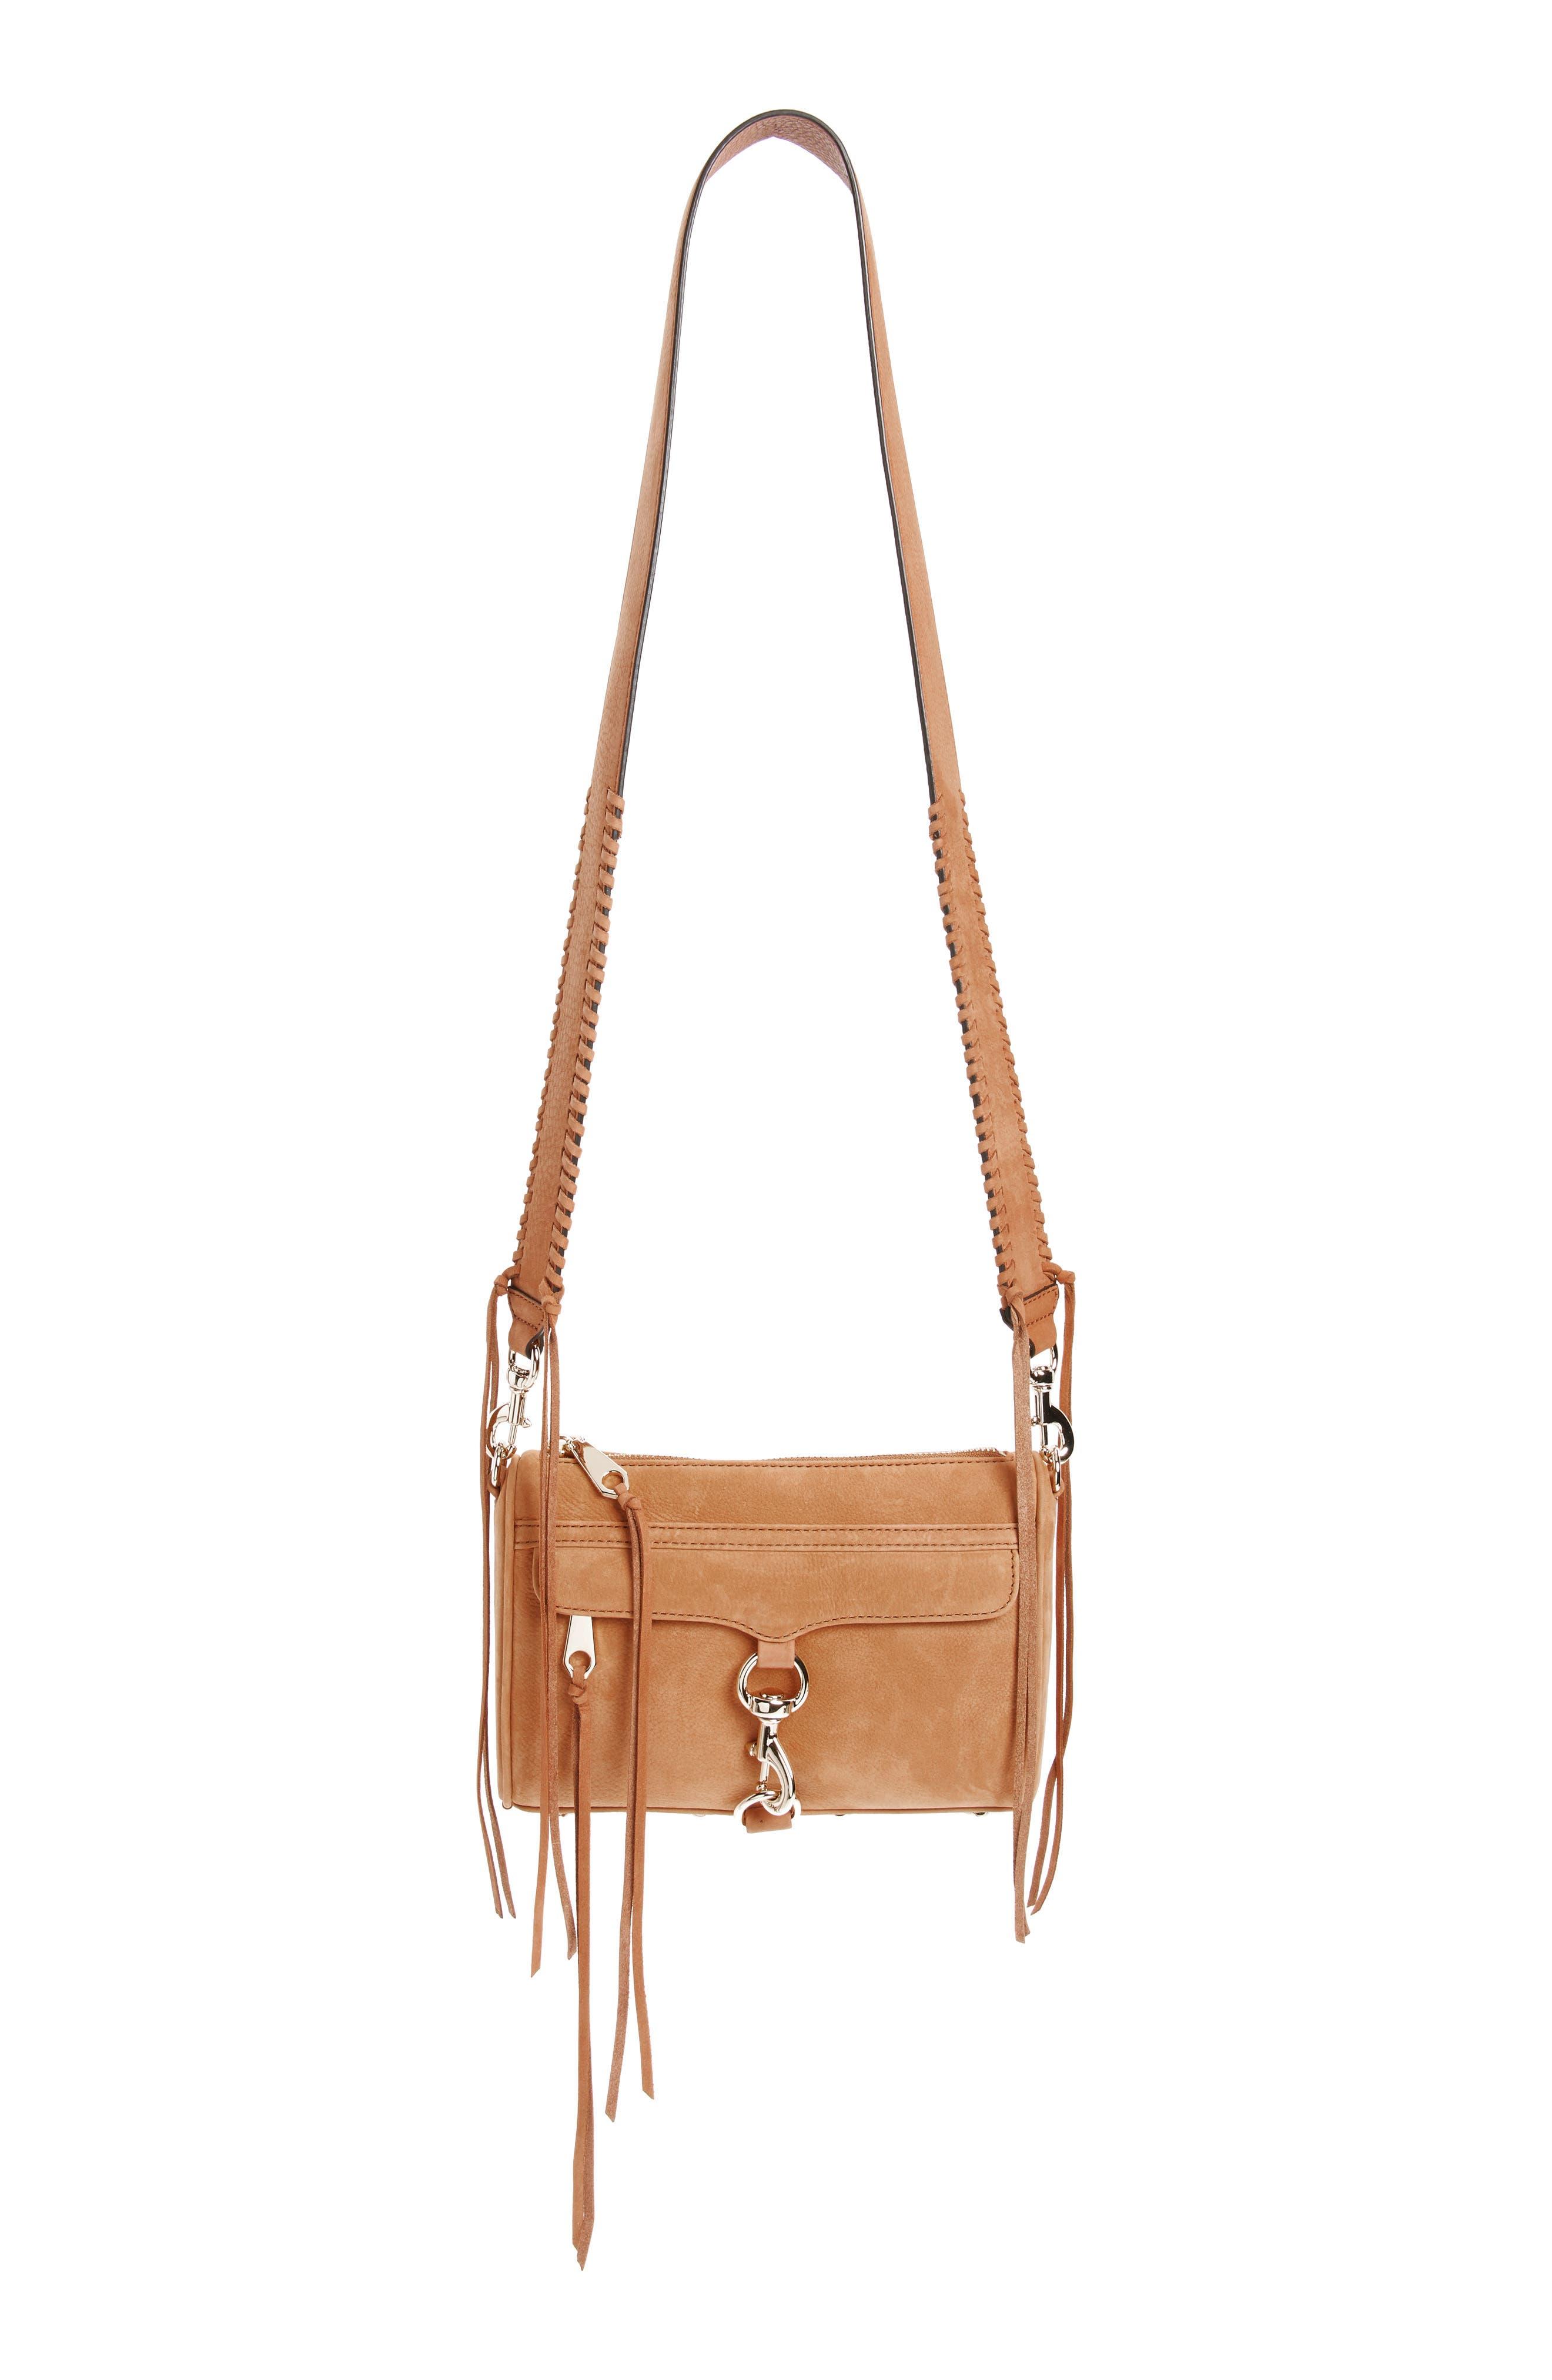 Alternate Image 1 Selected - Rebecca Minkoff Mini MAC Convertible Crossbody Bag